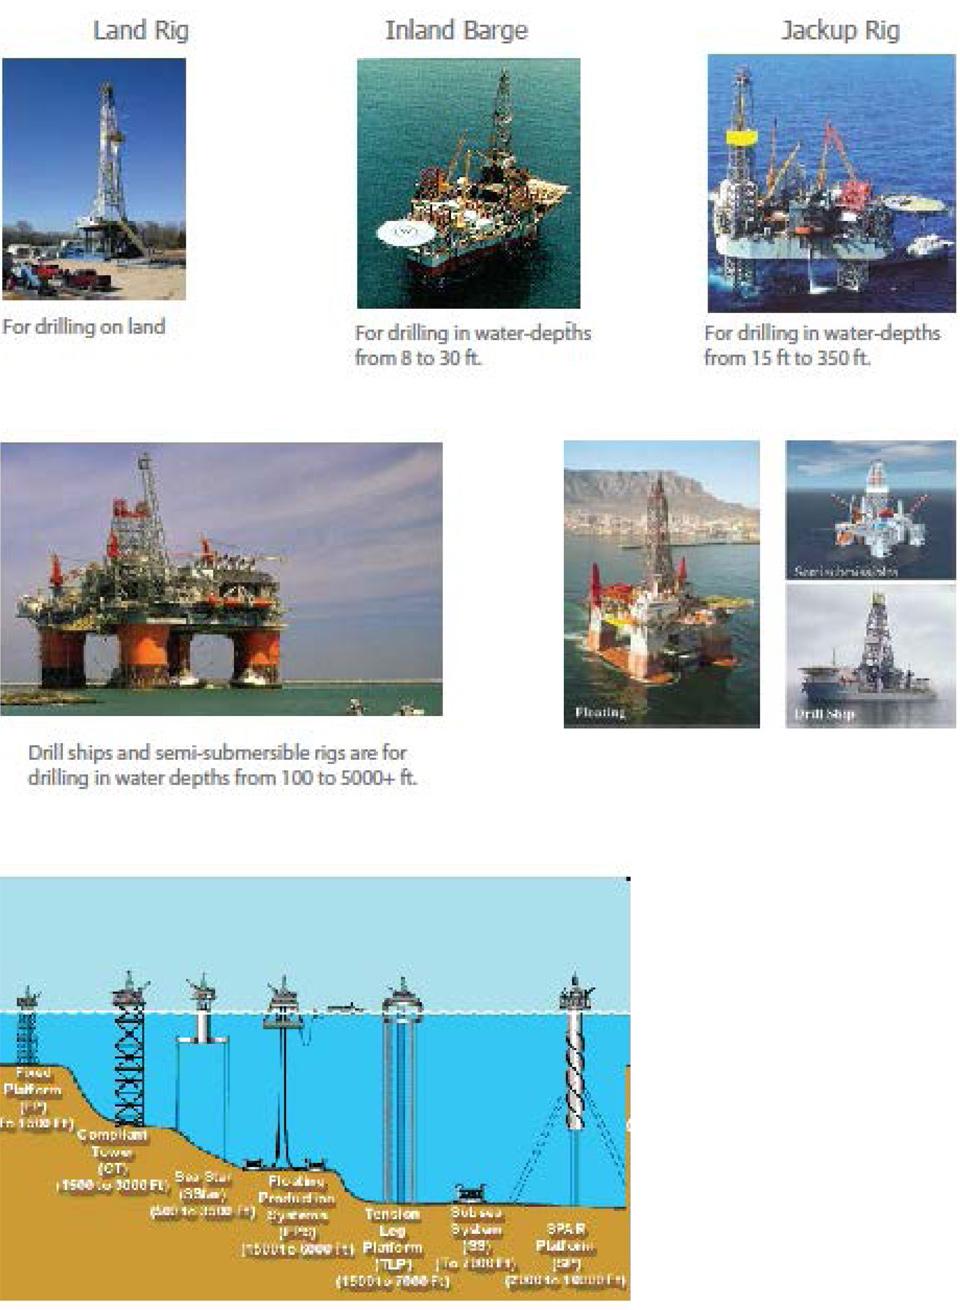 oilandgas-typesofrig